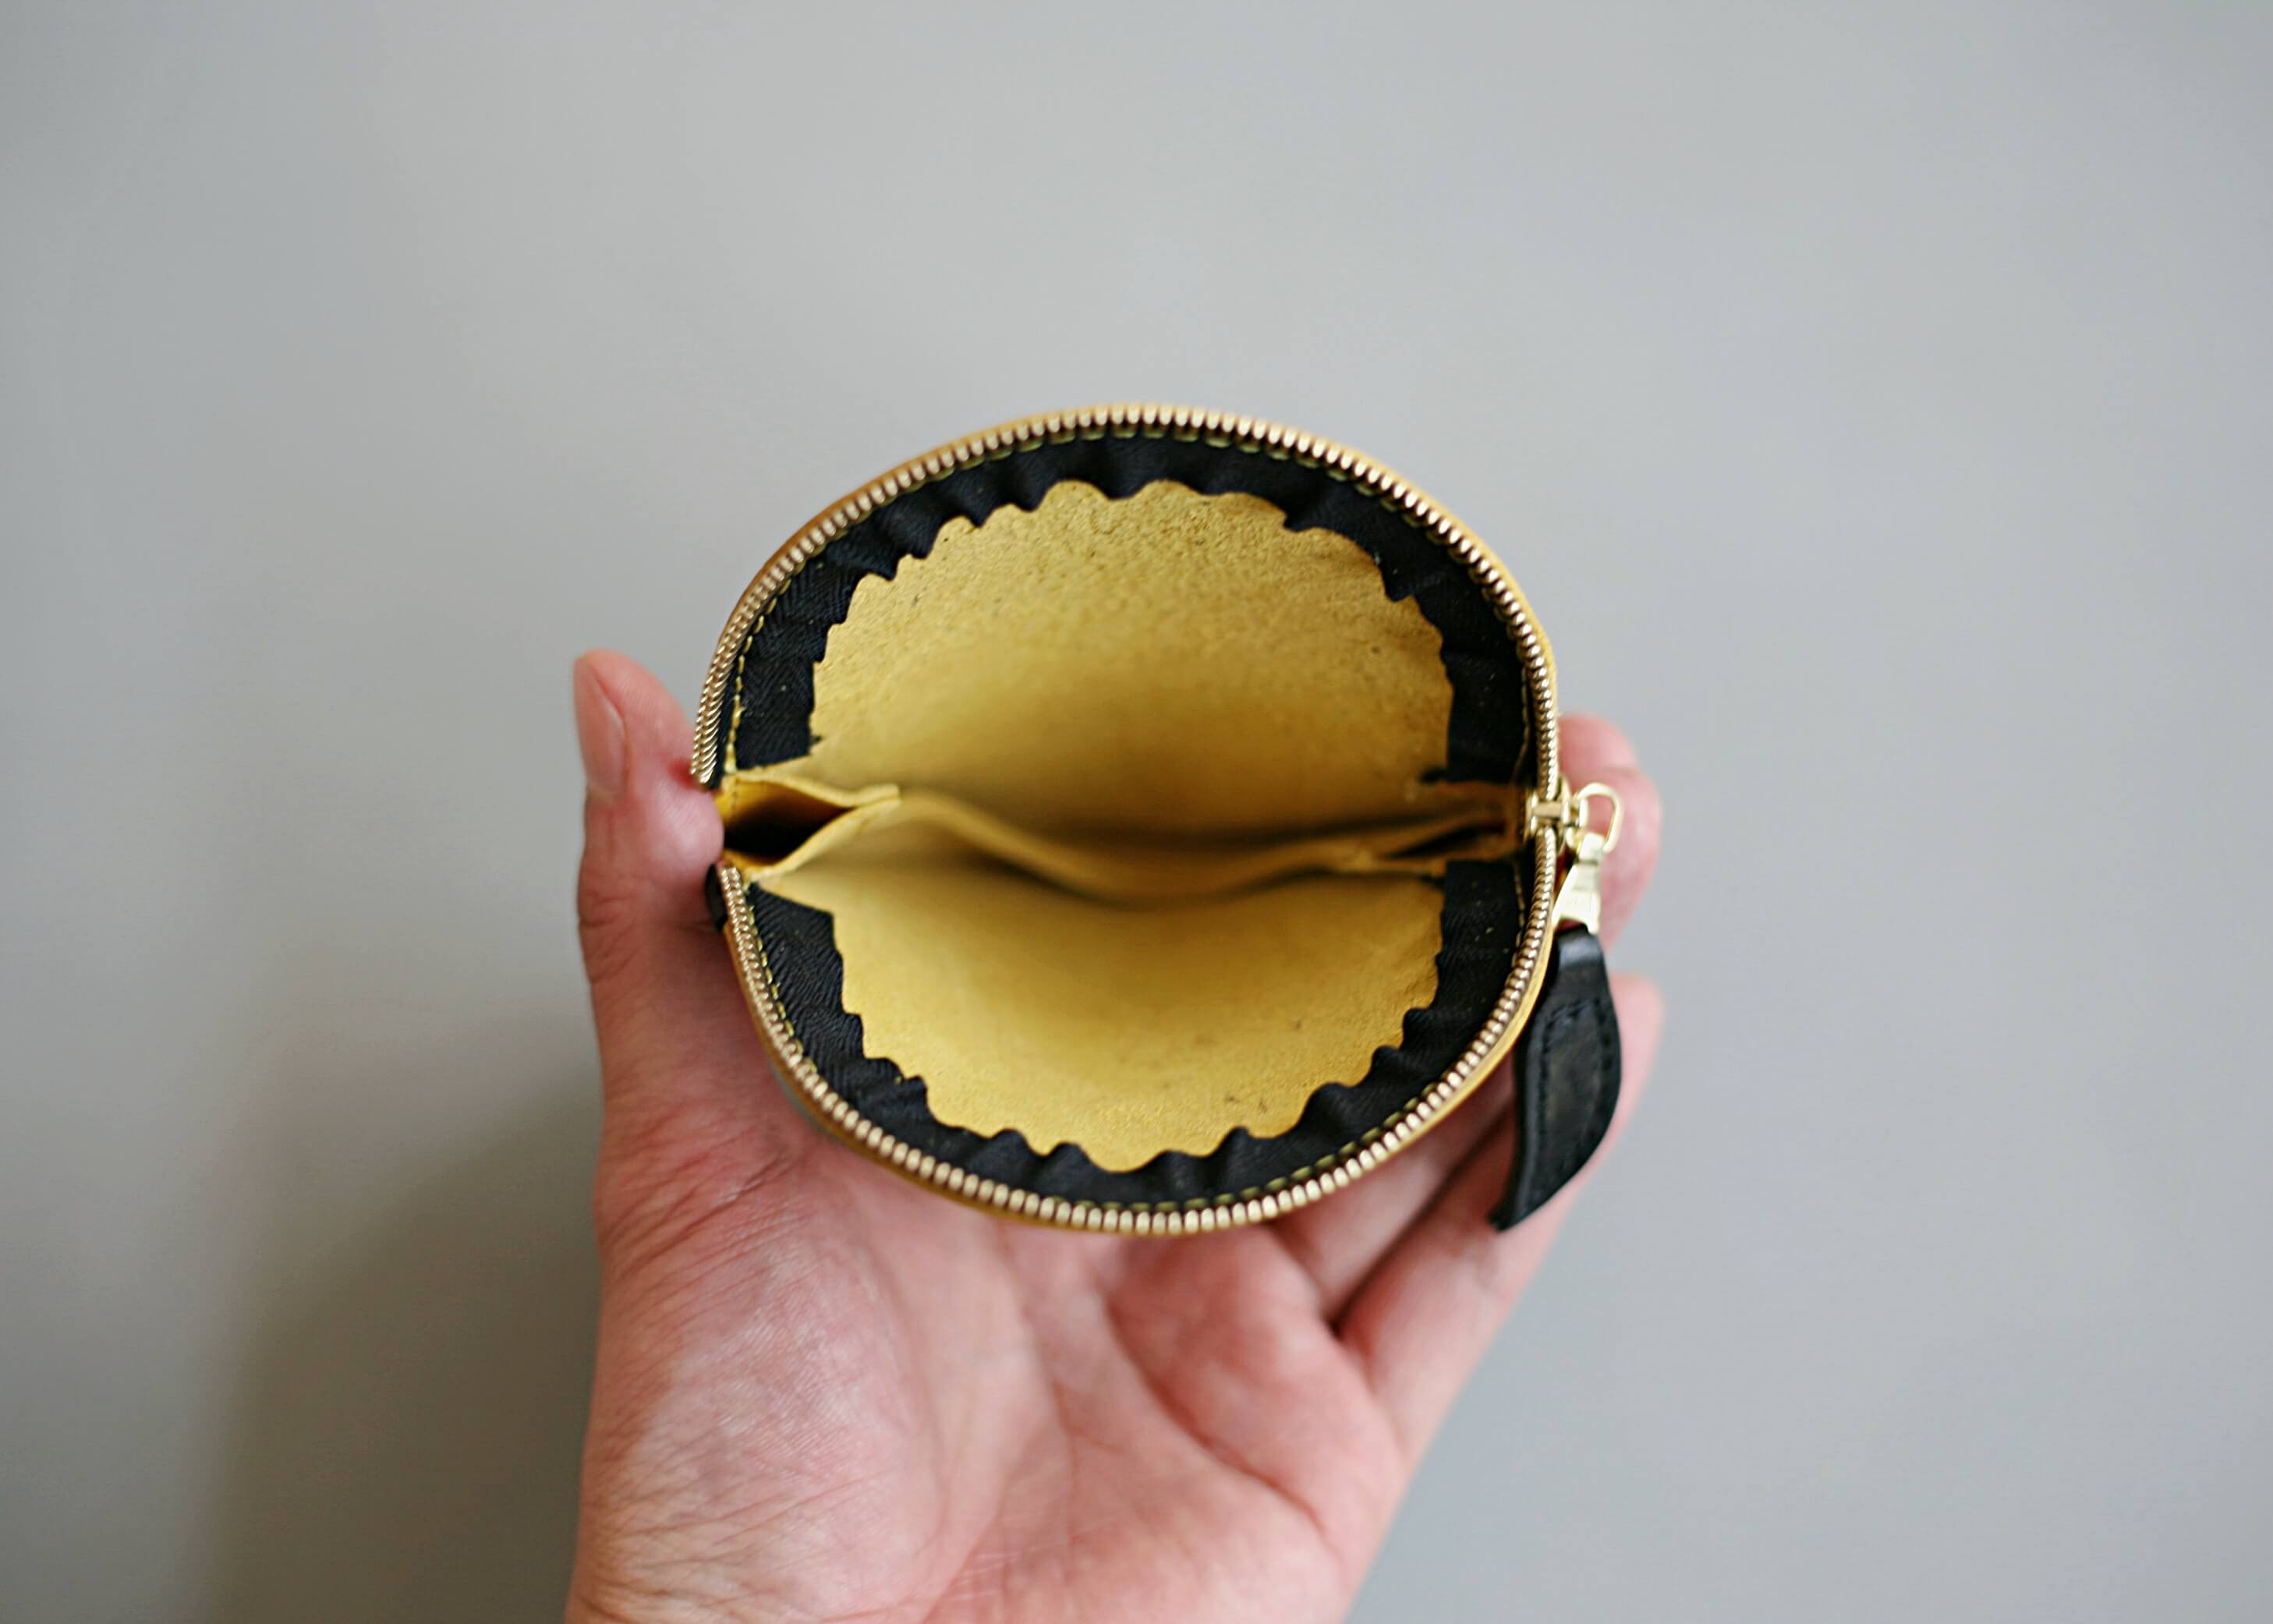 20/80 kip leather grapefruit coin purse 口を開けた状態